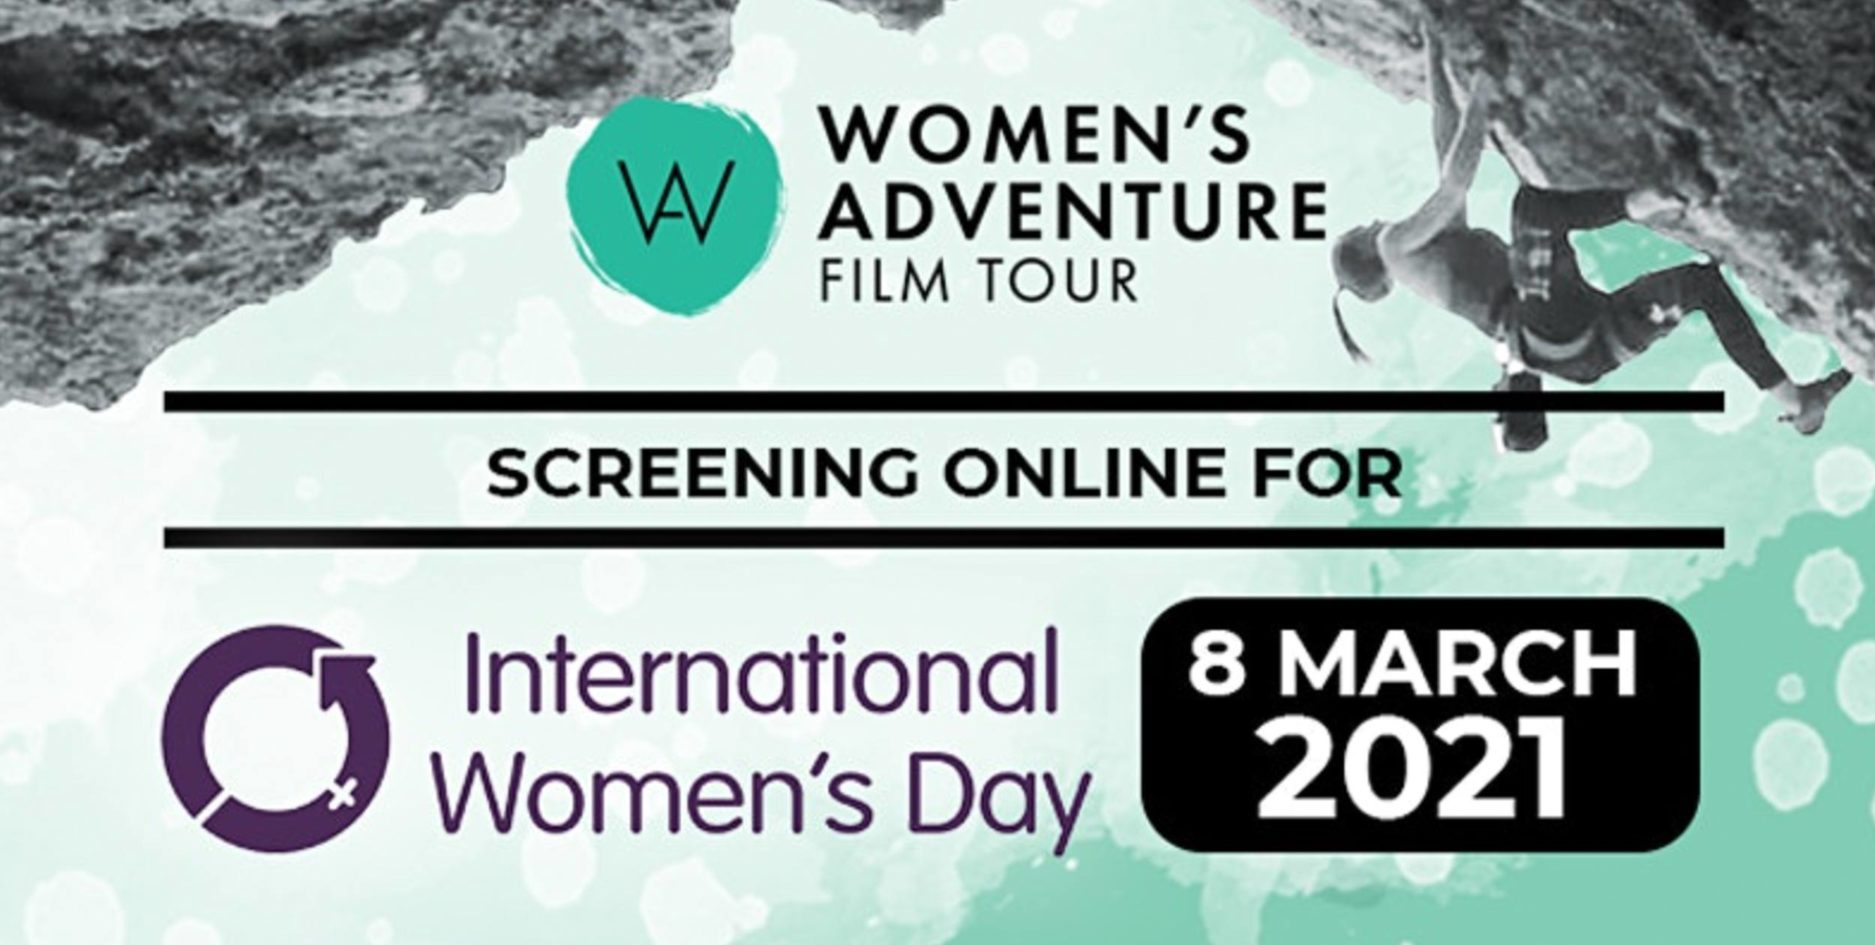 Women's Adventure Film Tour 2021